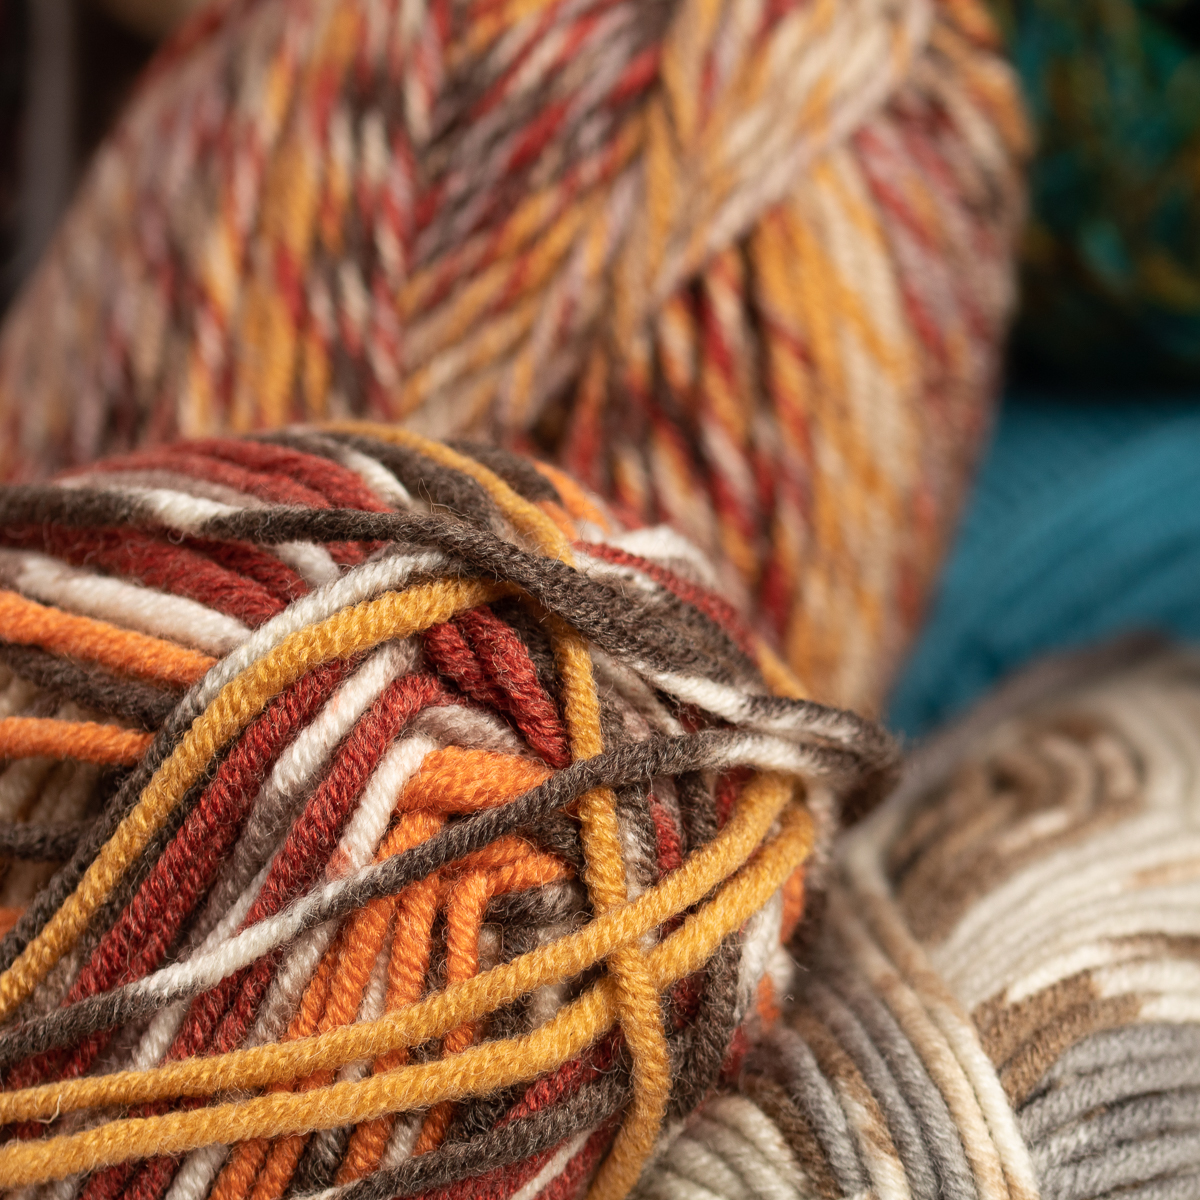 3pk-Lion-Brand-Woolspun-Acrylic-amp-Wool-Yarn-Bulky-5-Knit-Crocheting-Skeins-Soft thumbnail 38